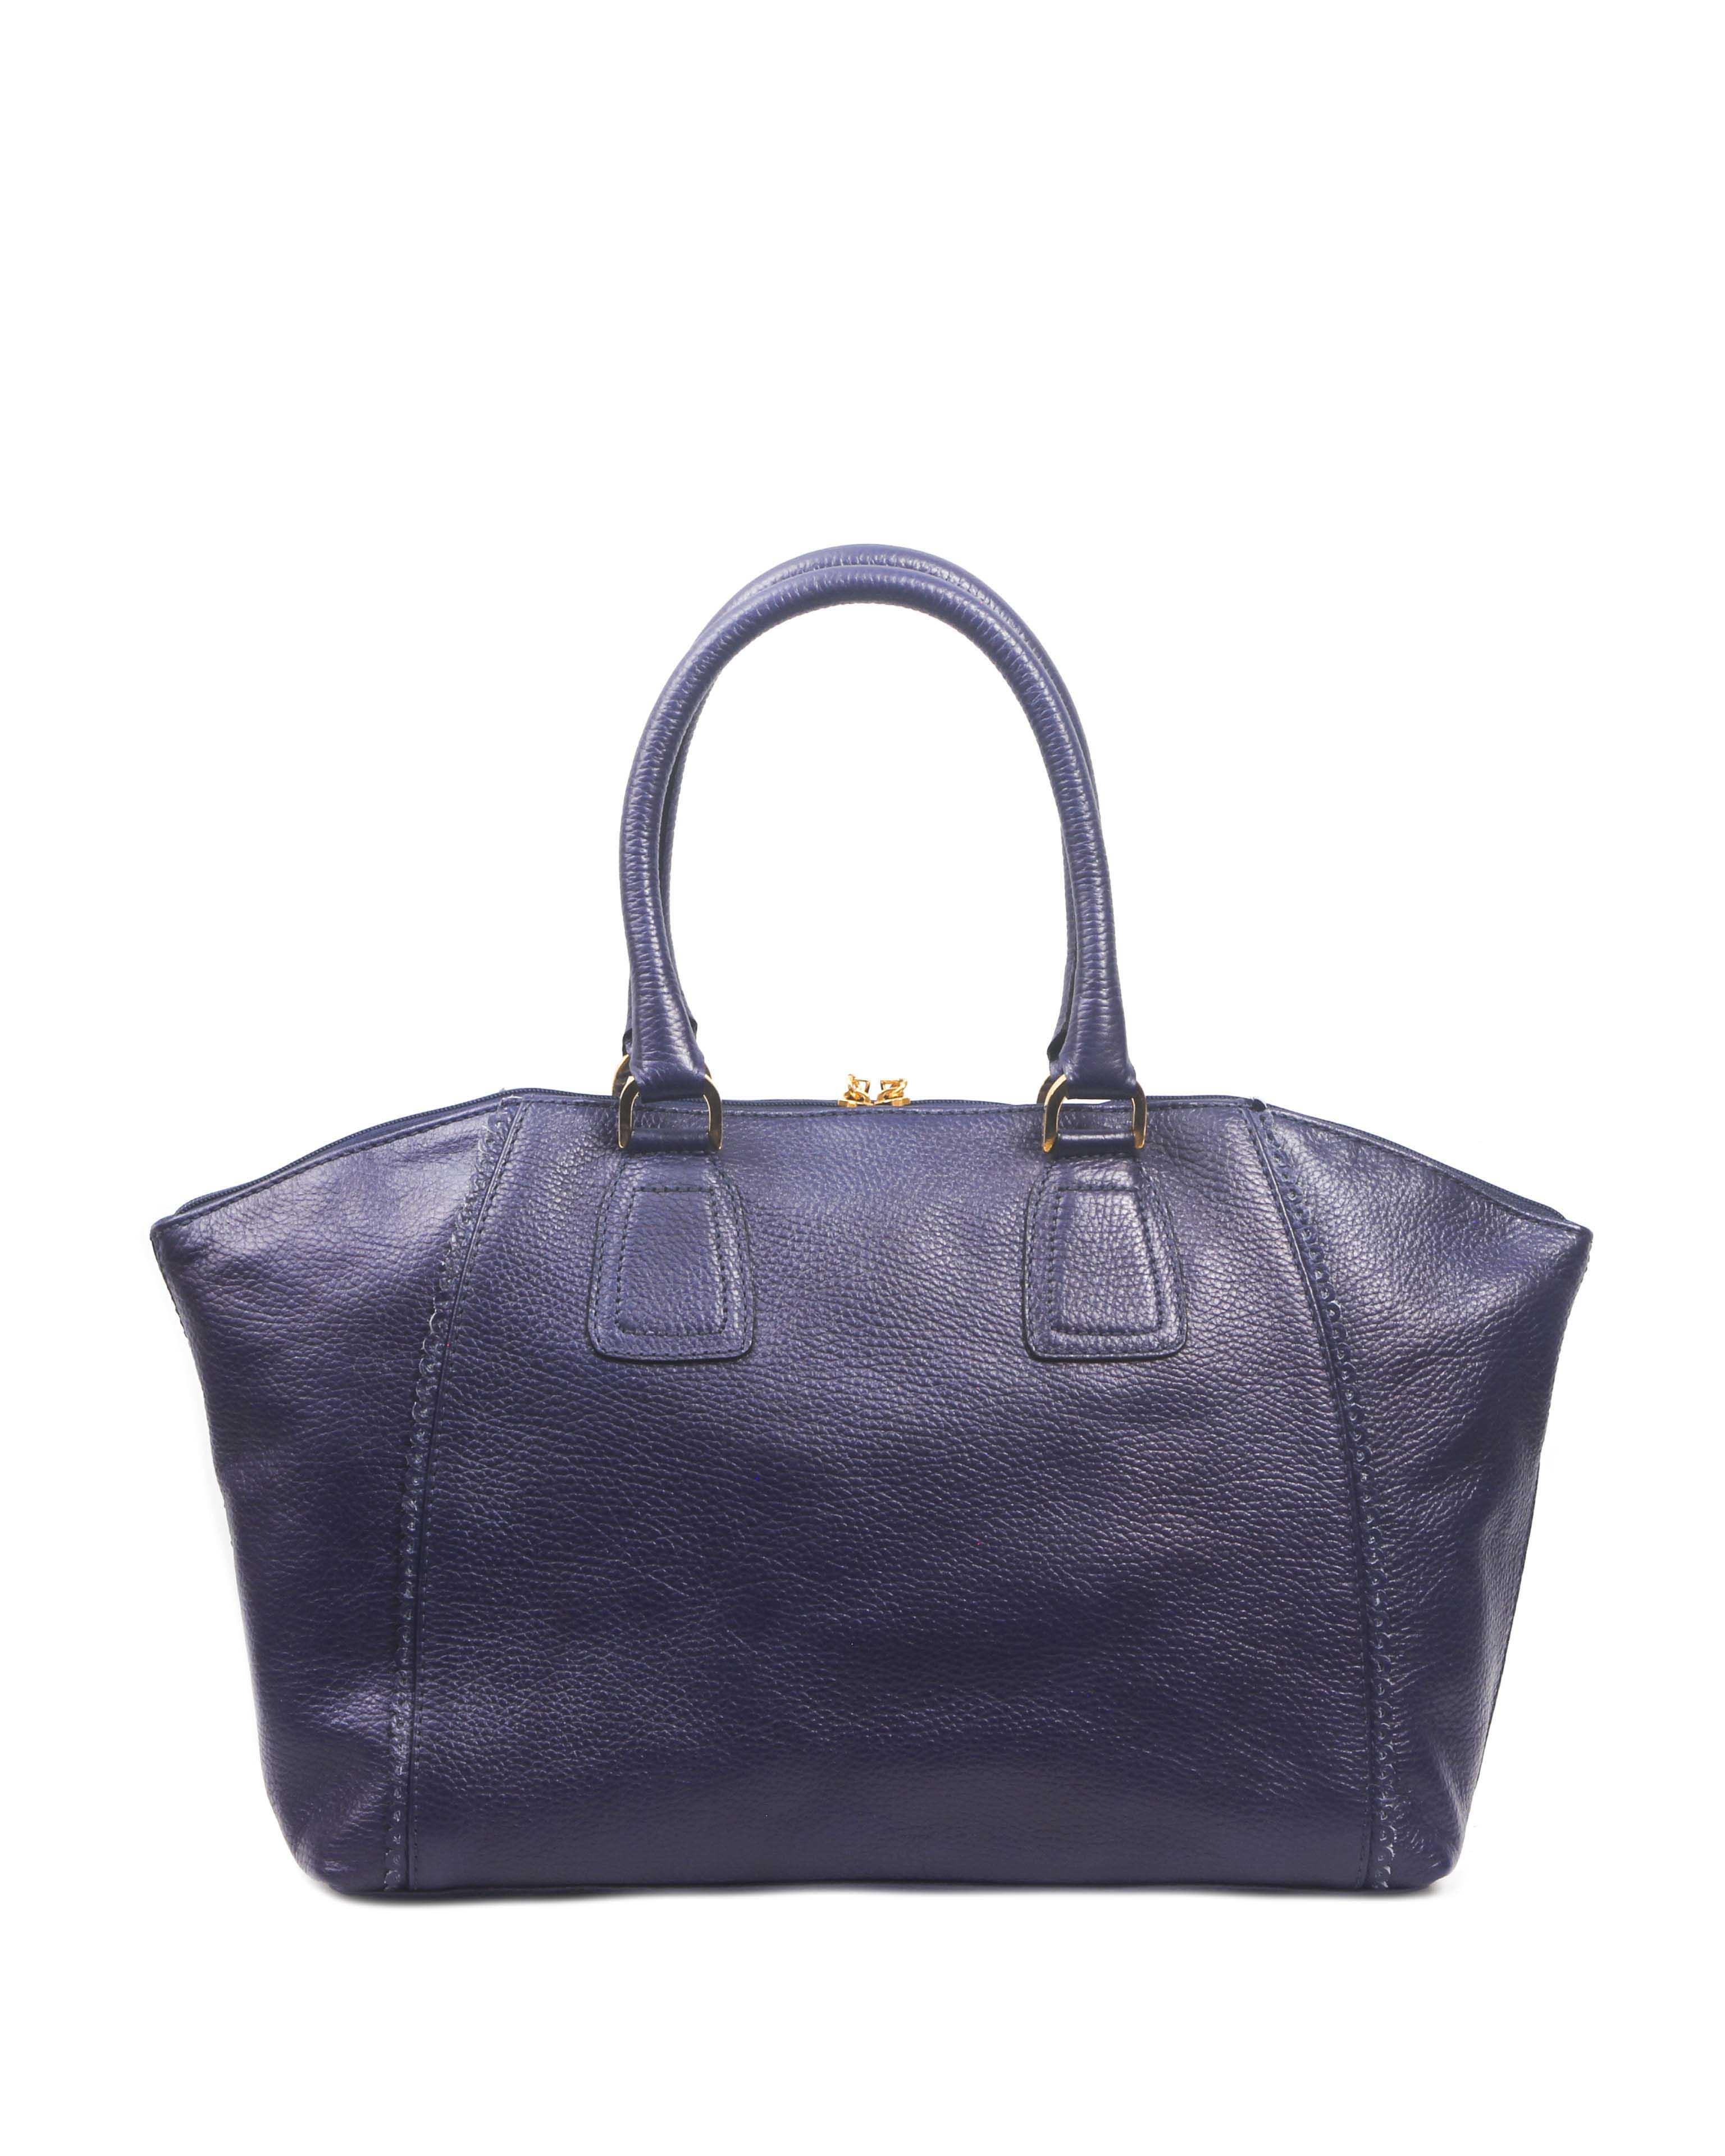 Cartera Tote Bag DS-2507 Color Azul